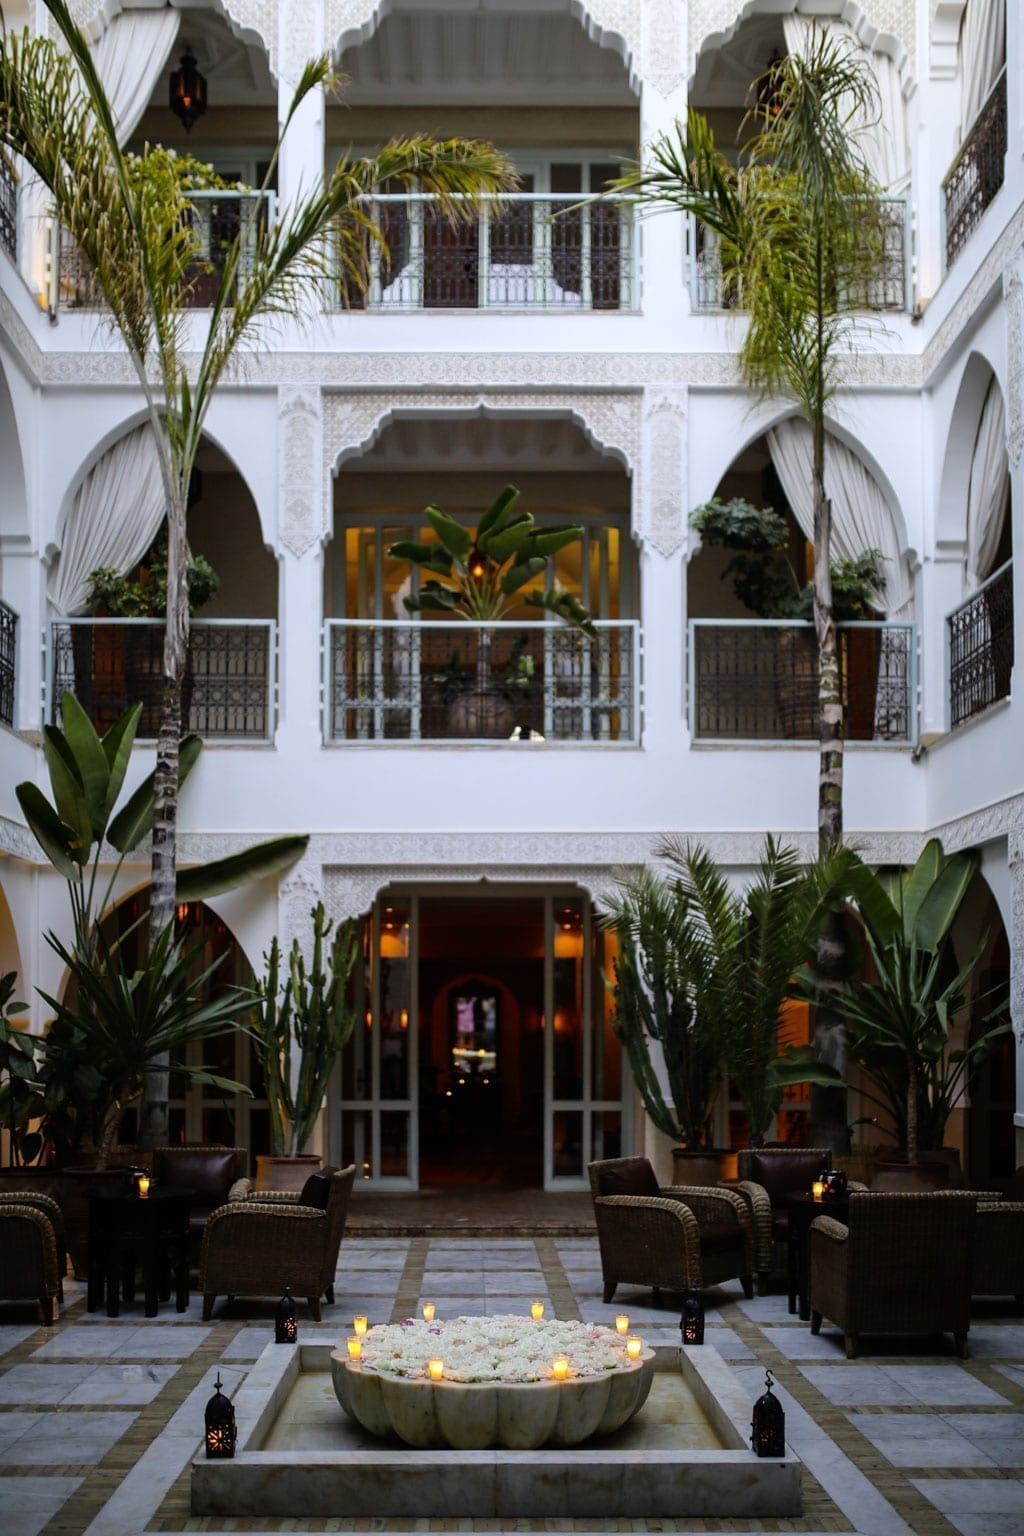 Karin Kaswurm in Marokko, Agadir mir L'Oreal für Aura Botanica